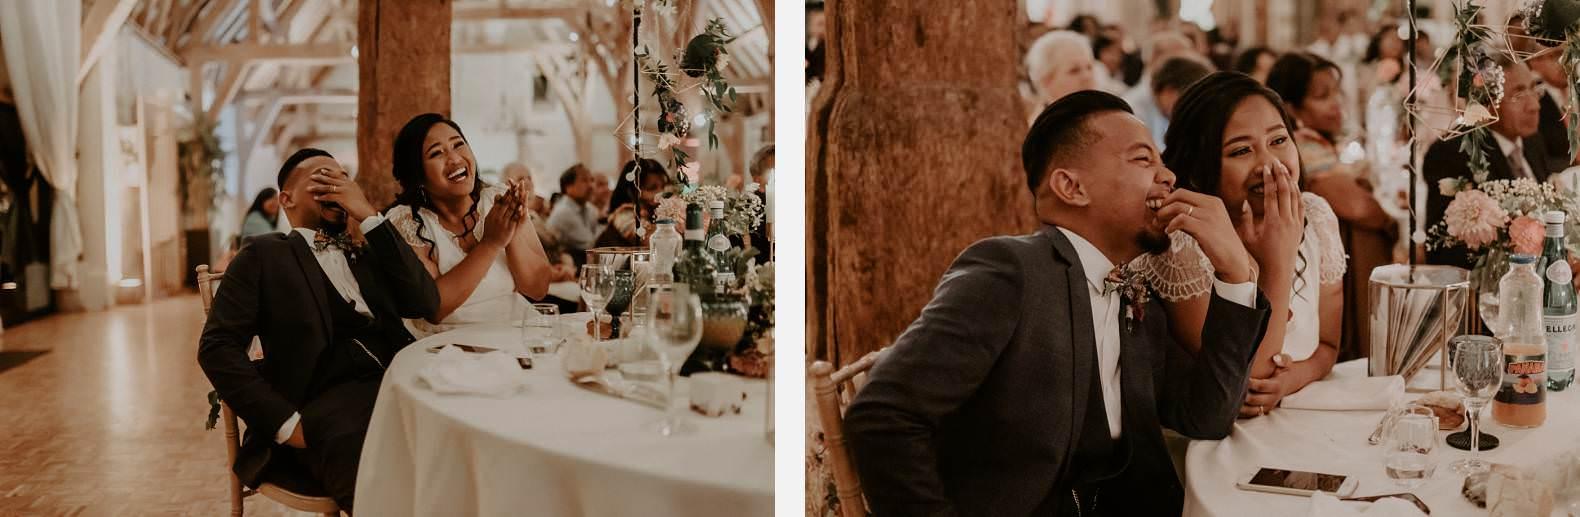 mariage manoir de corny photographe bel esprit 0066 1